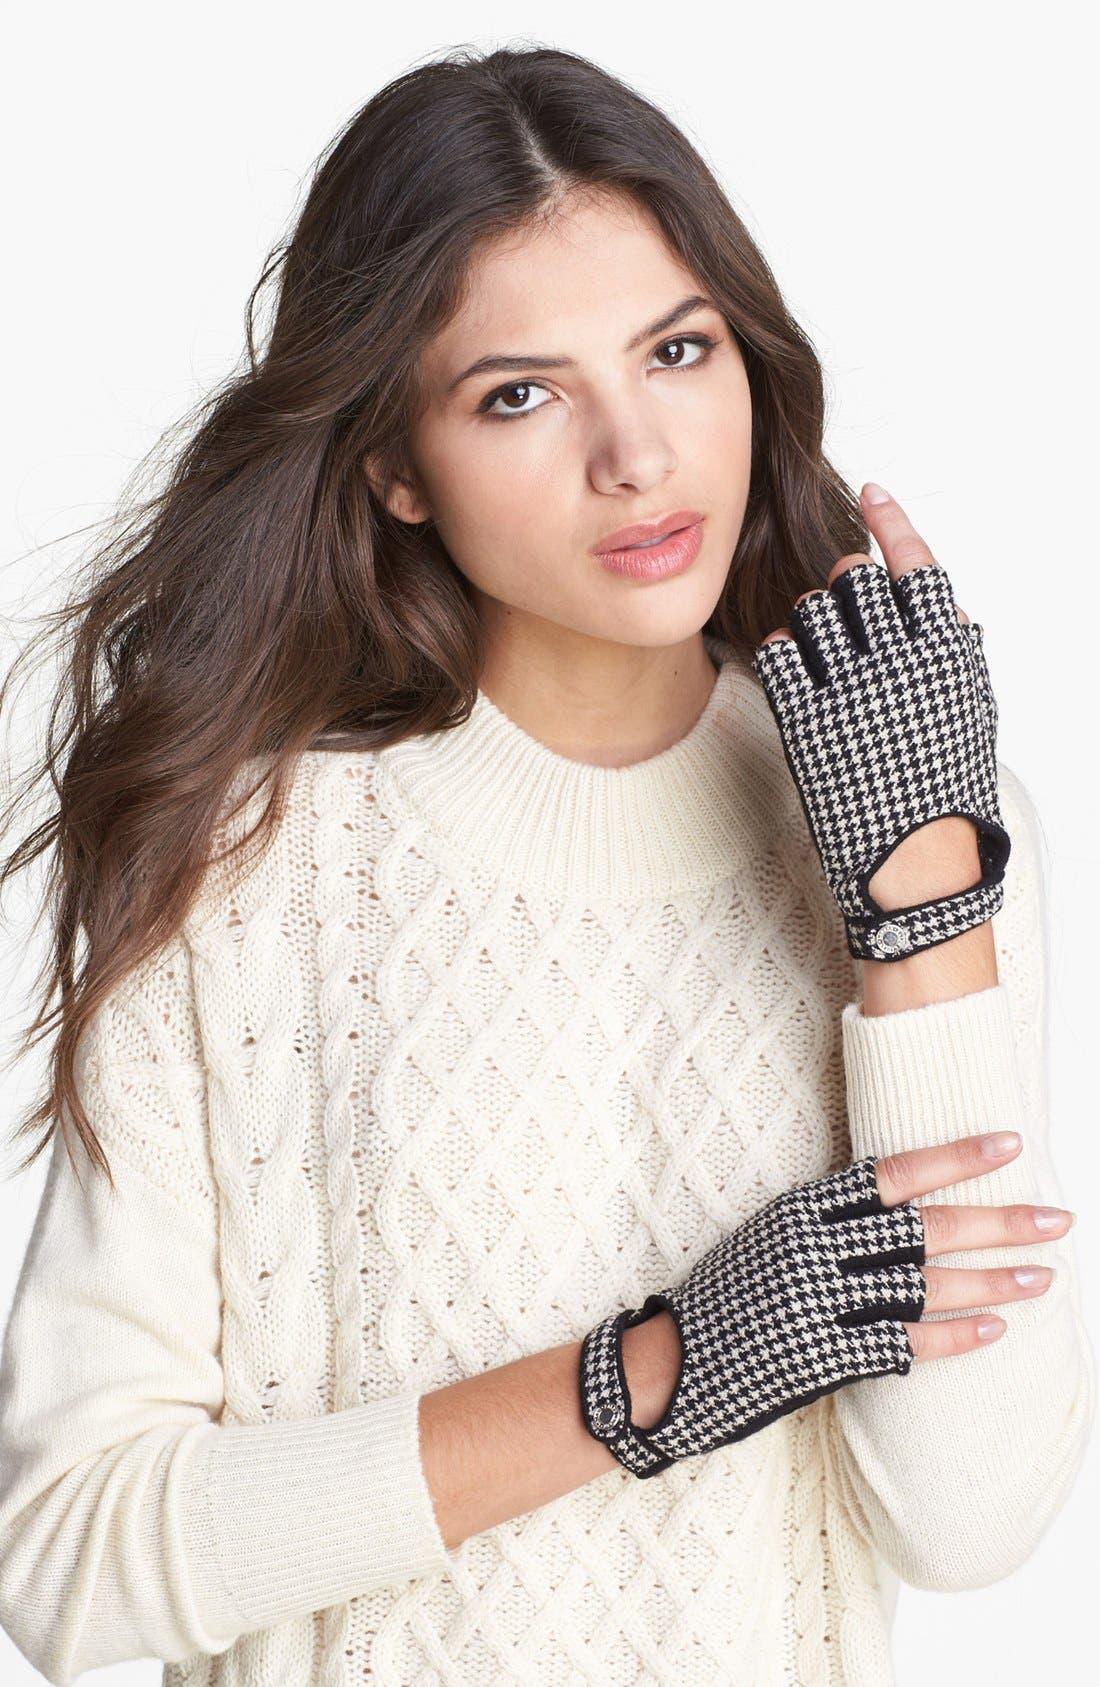 Alternate Image 1 Selected - Lauren Ralph Lauren Houndstooth Fingerless Driving Gloves